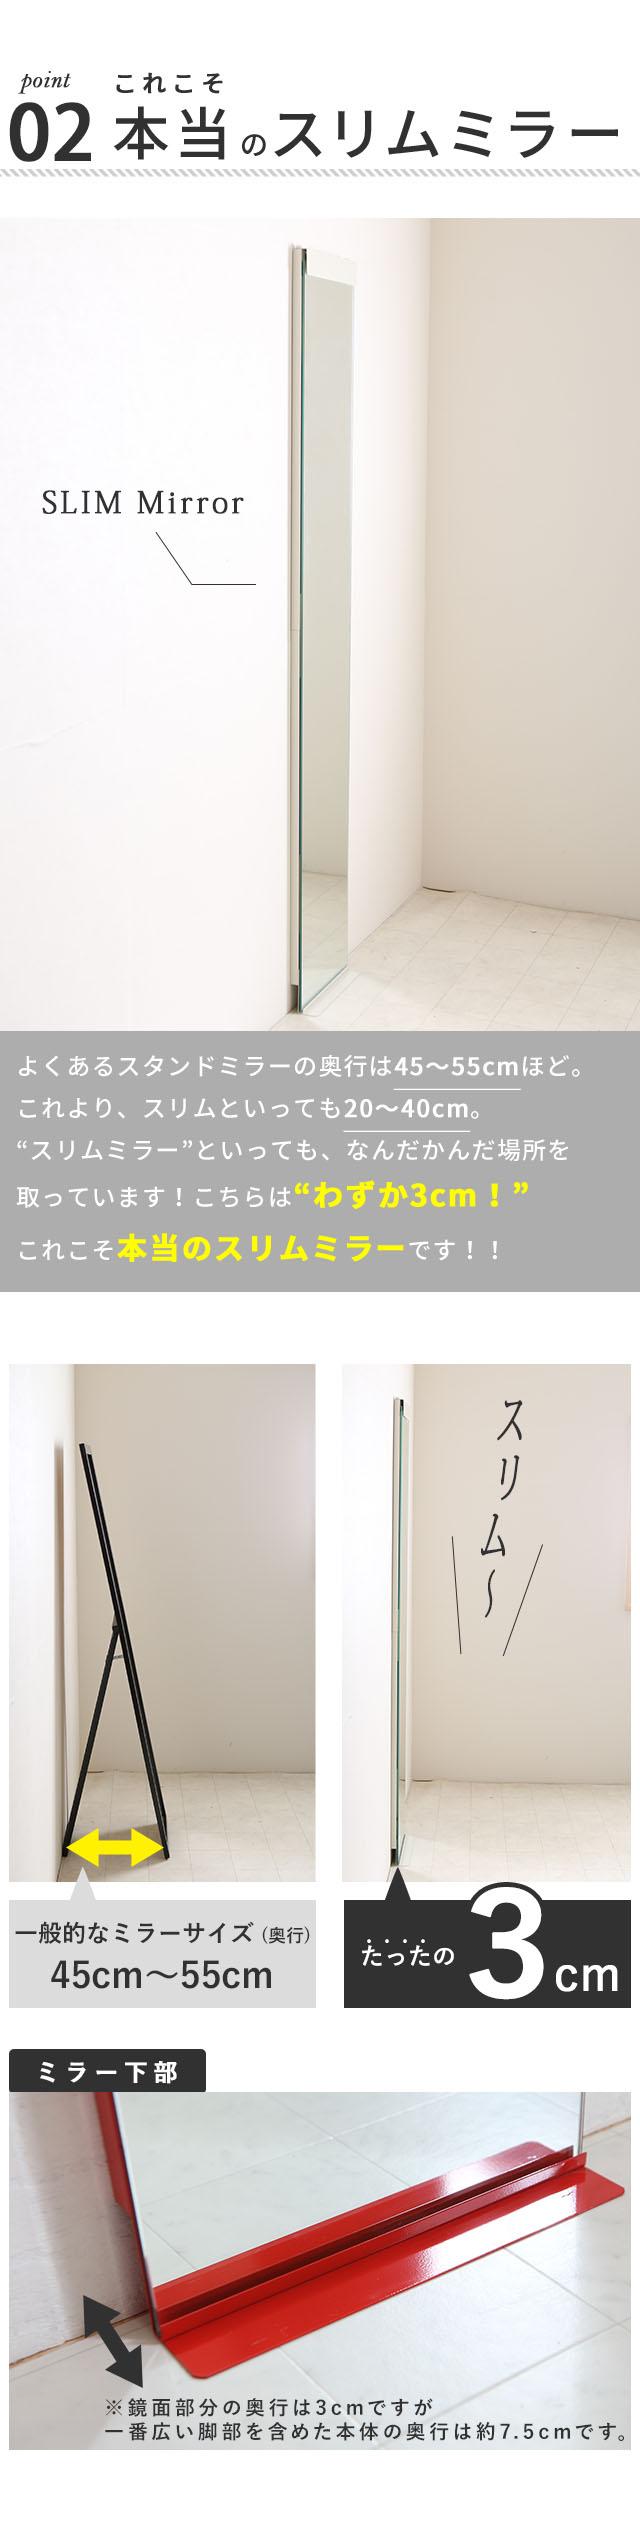 『Accent+ 壁掛けミラー』 角型 1